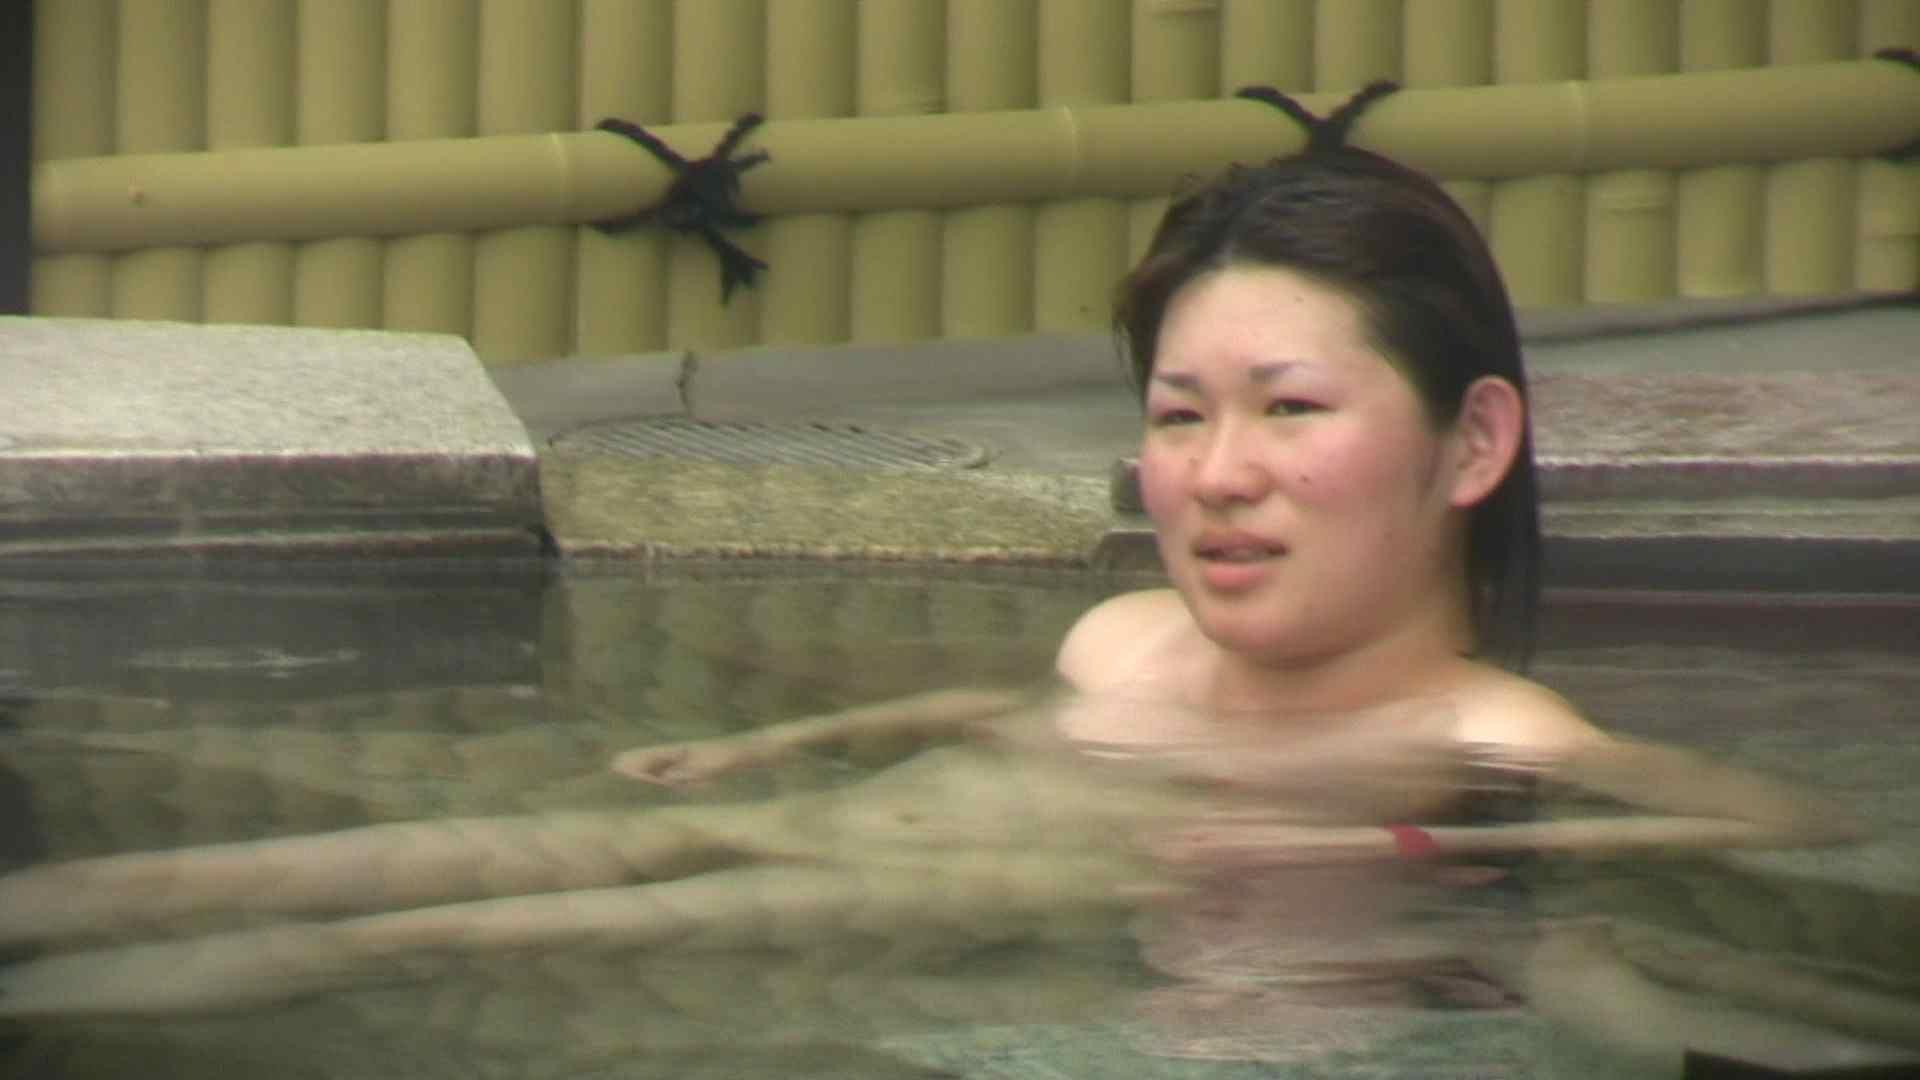 Aquaな露天風呂Vol.673 盗撮 おめこ無修正画像 45連発 44